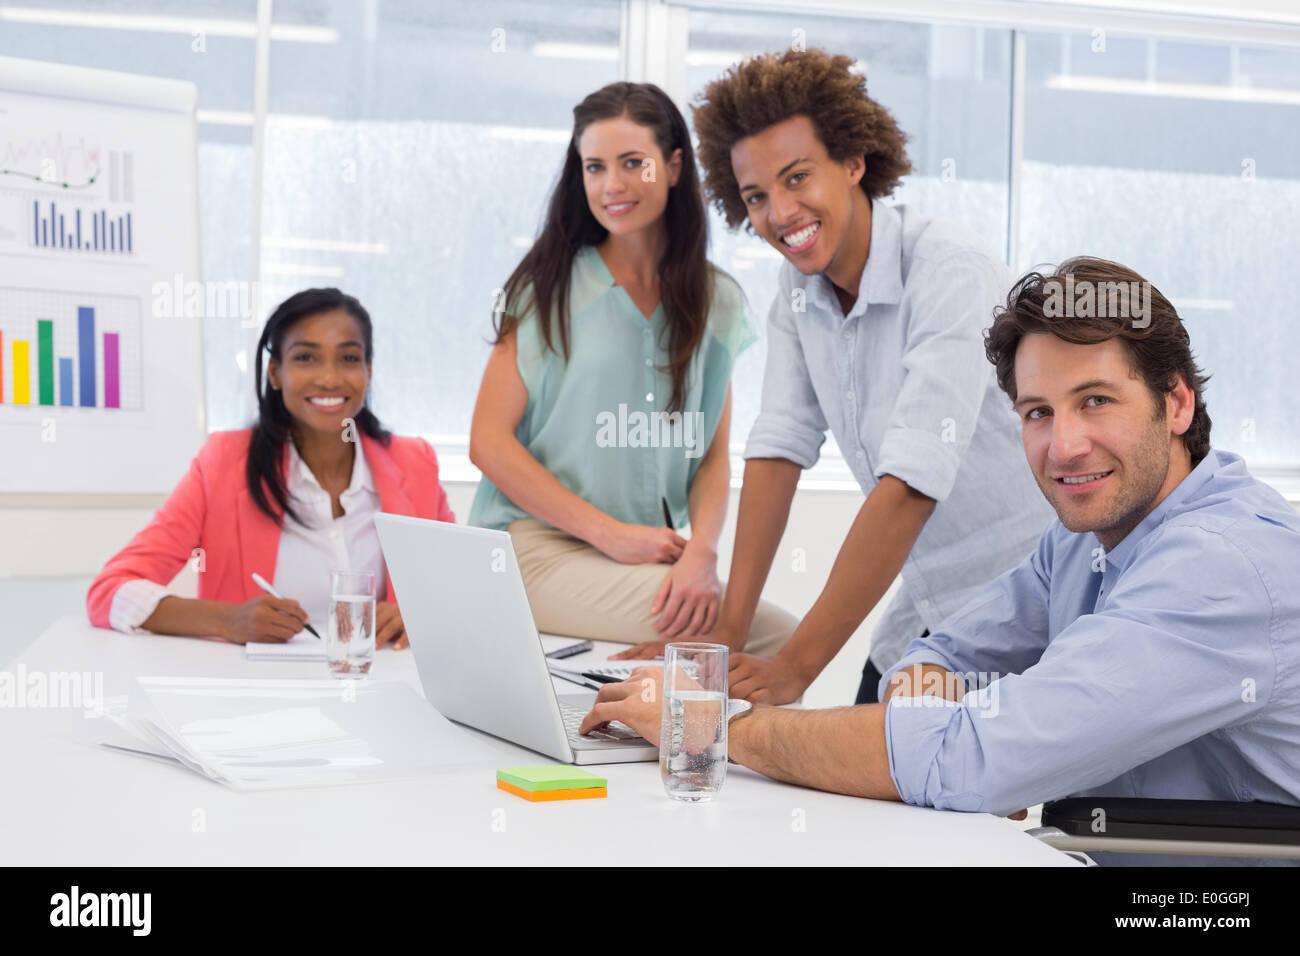 Attraktive Business-Menschen am Arbeitsplatz Stockbild